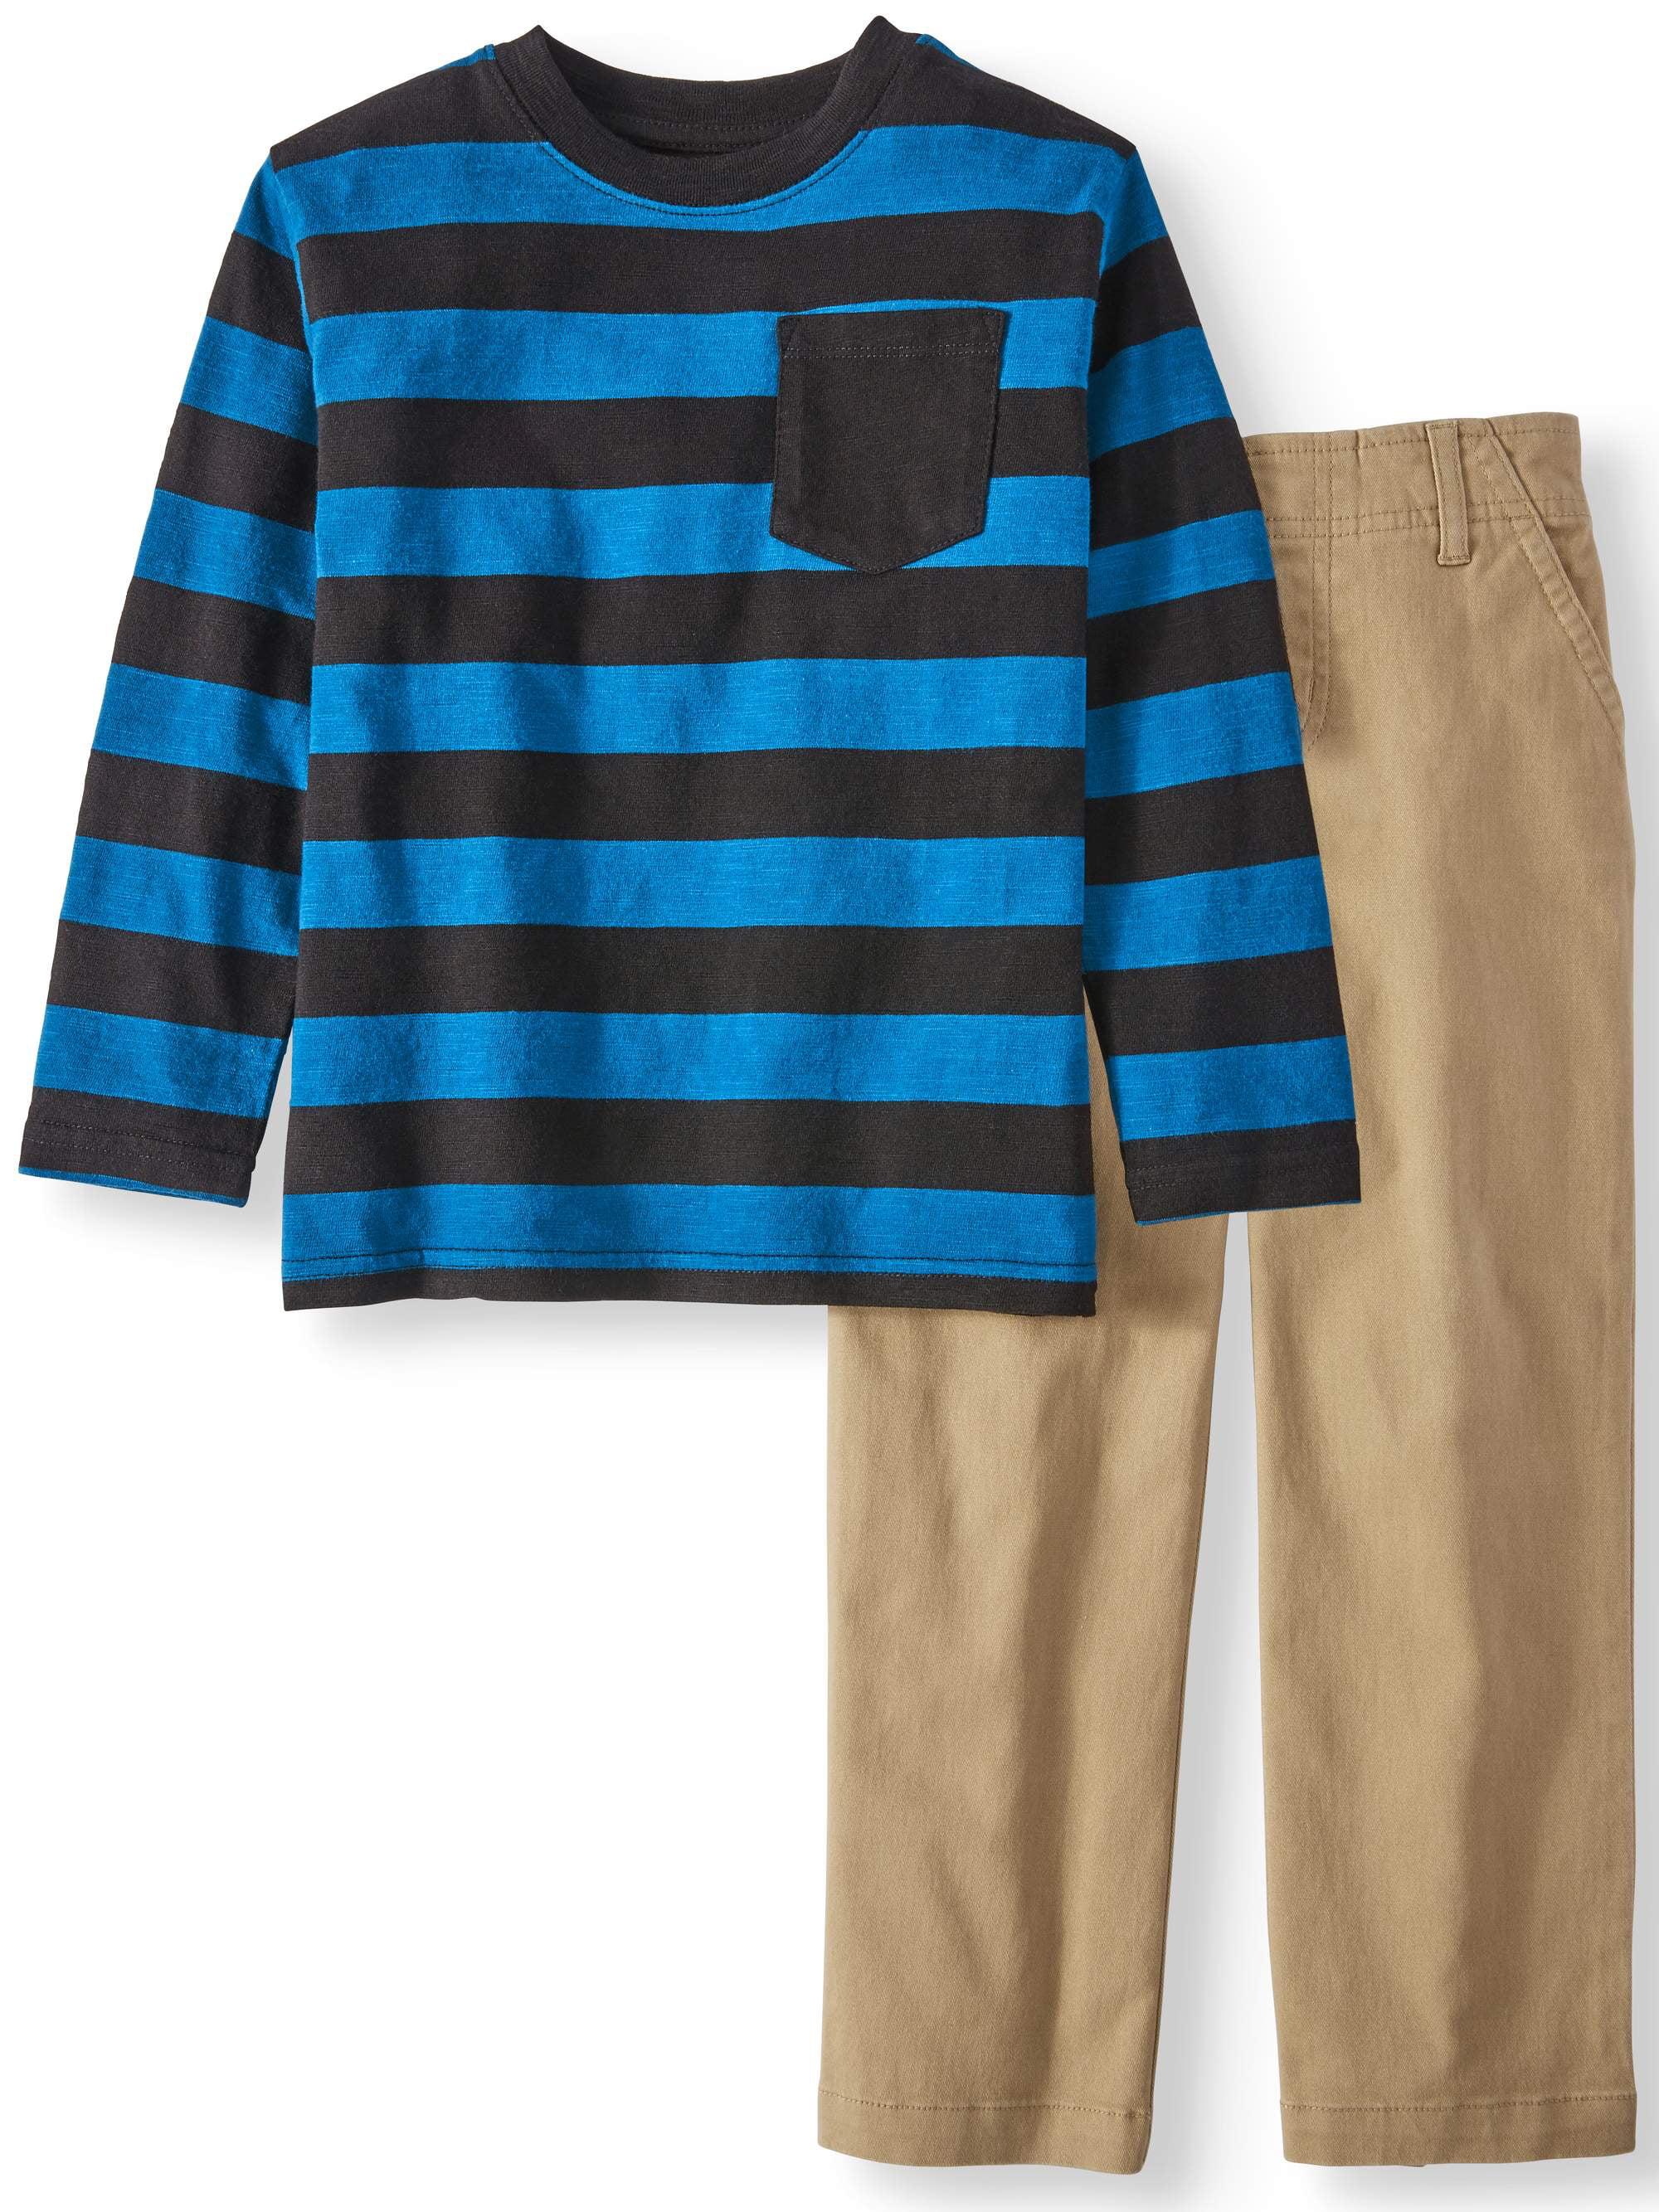 Long Sleeve Striped Pocket T-Shirt & Woven Pants, 2pc Outfit Set (Little Boys & Big Boys)